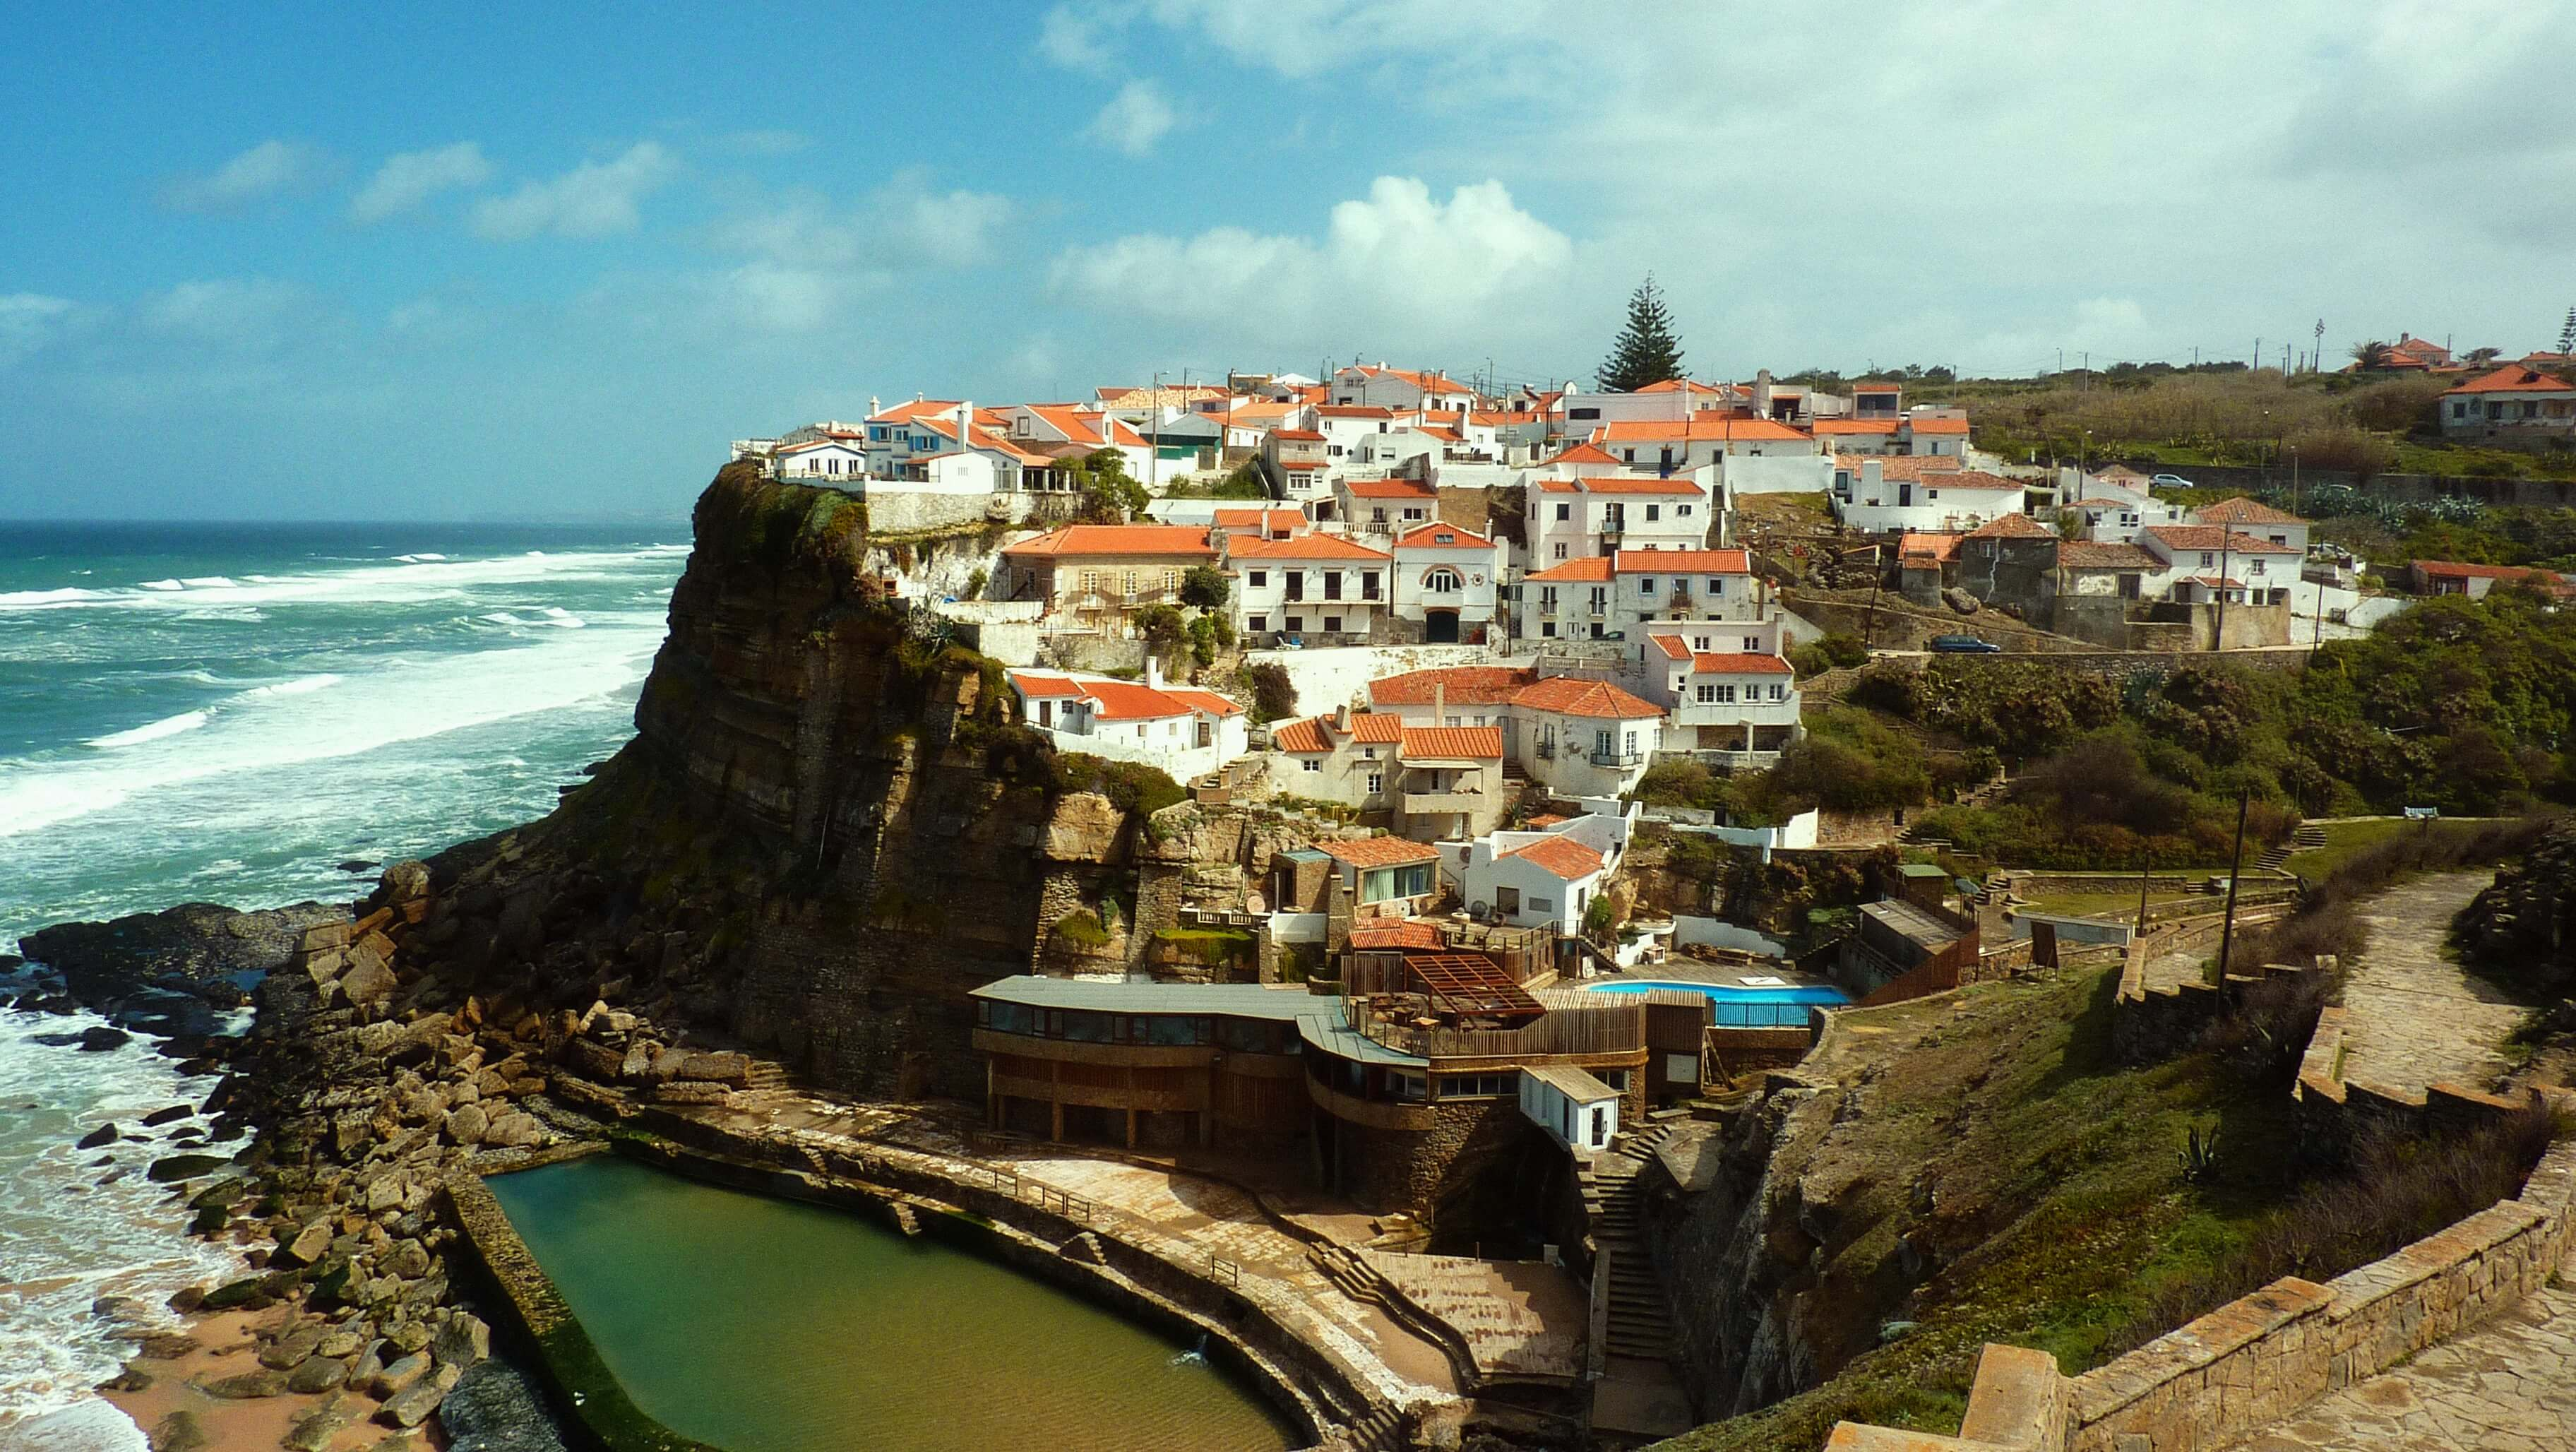 Azenhas do Mar, Portugal (le village)